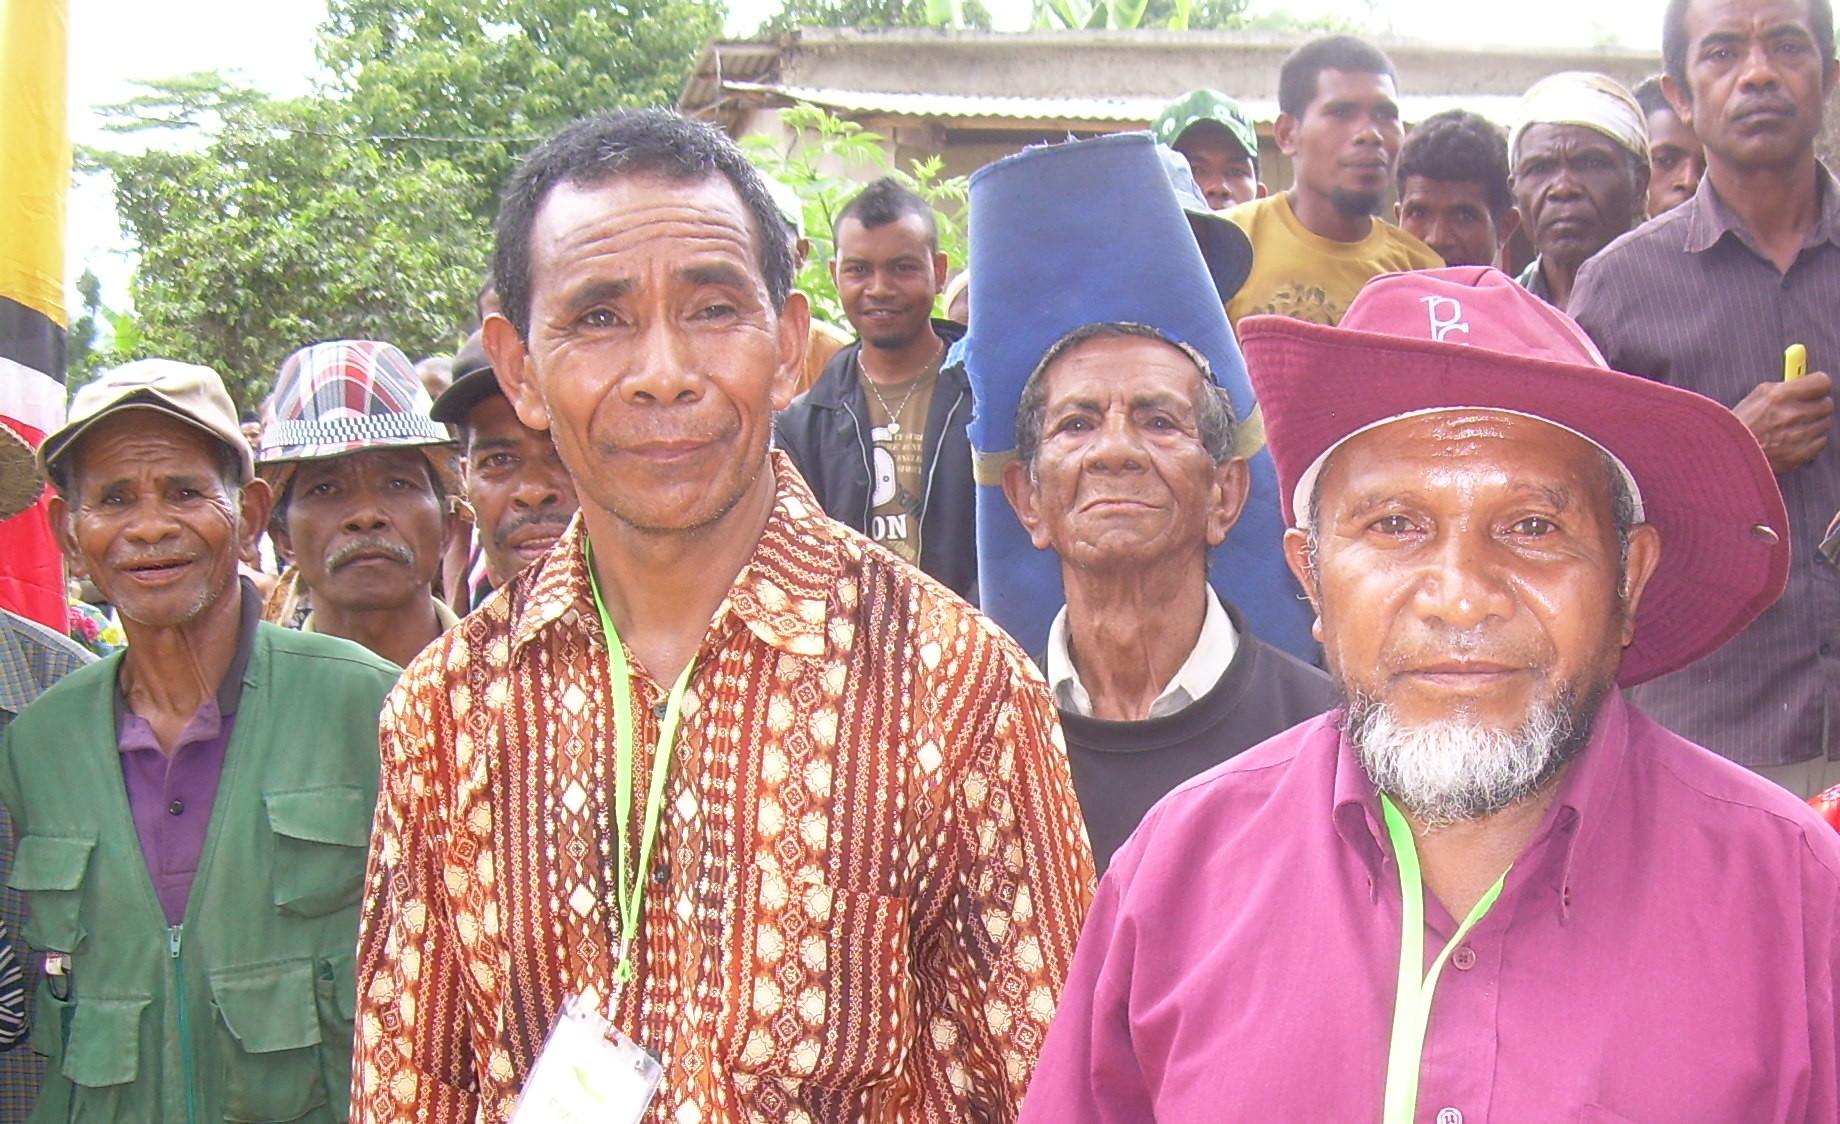 Manuel da Silva and Aileu villagers